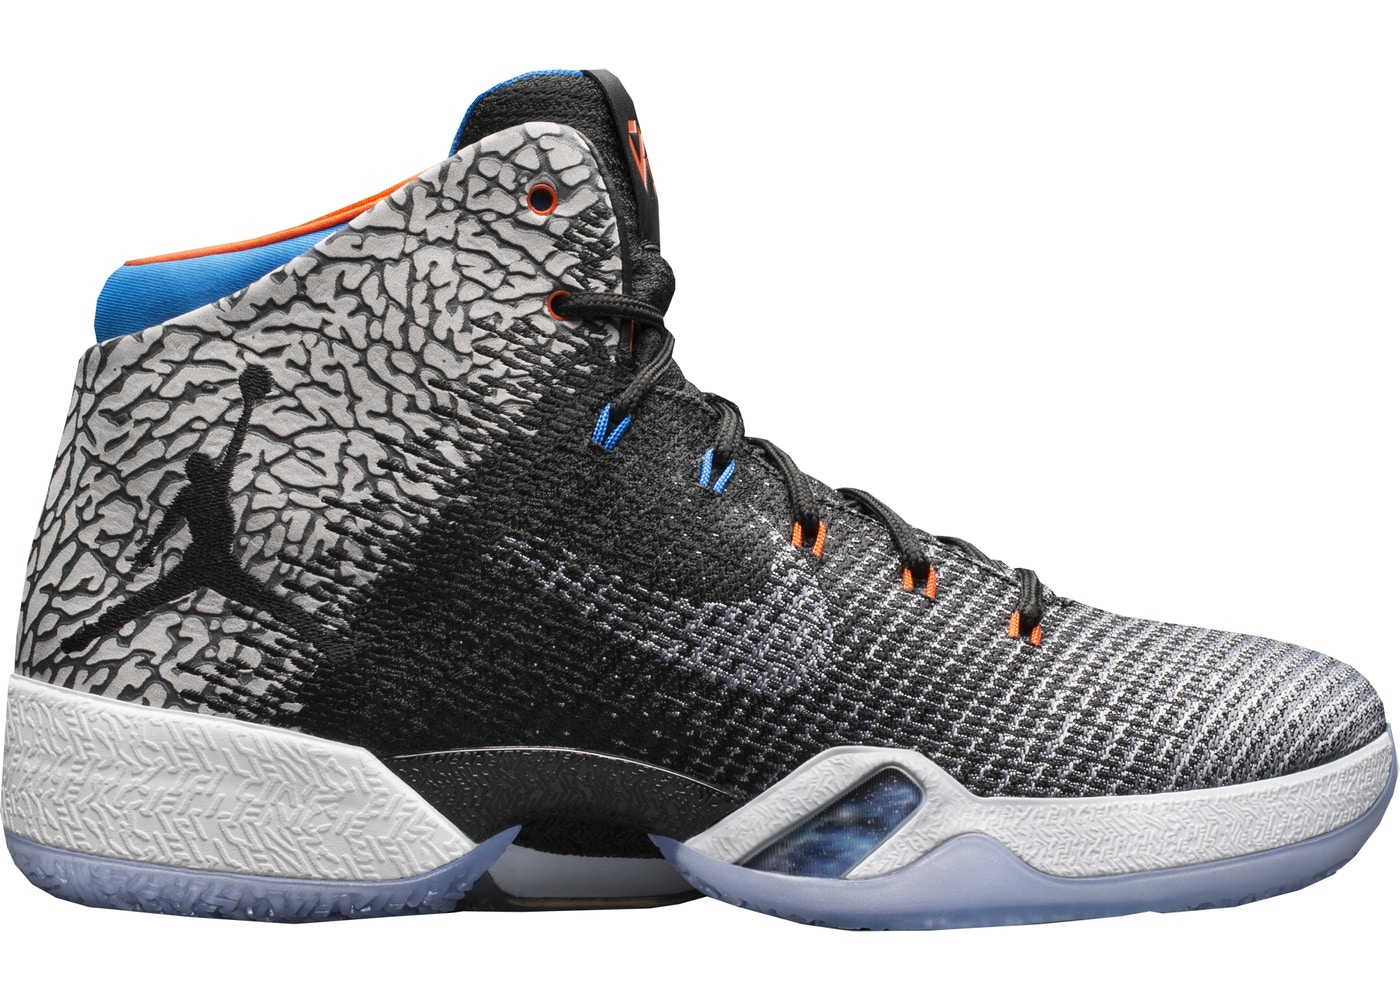 9f44262f9913 Buy Air Jordan 31 Size 15 Shoes   Deadstock Sneakers